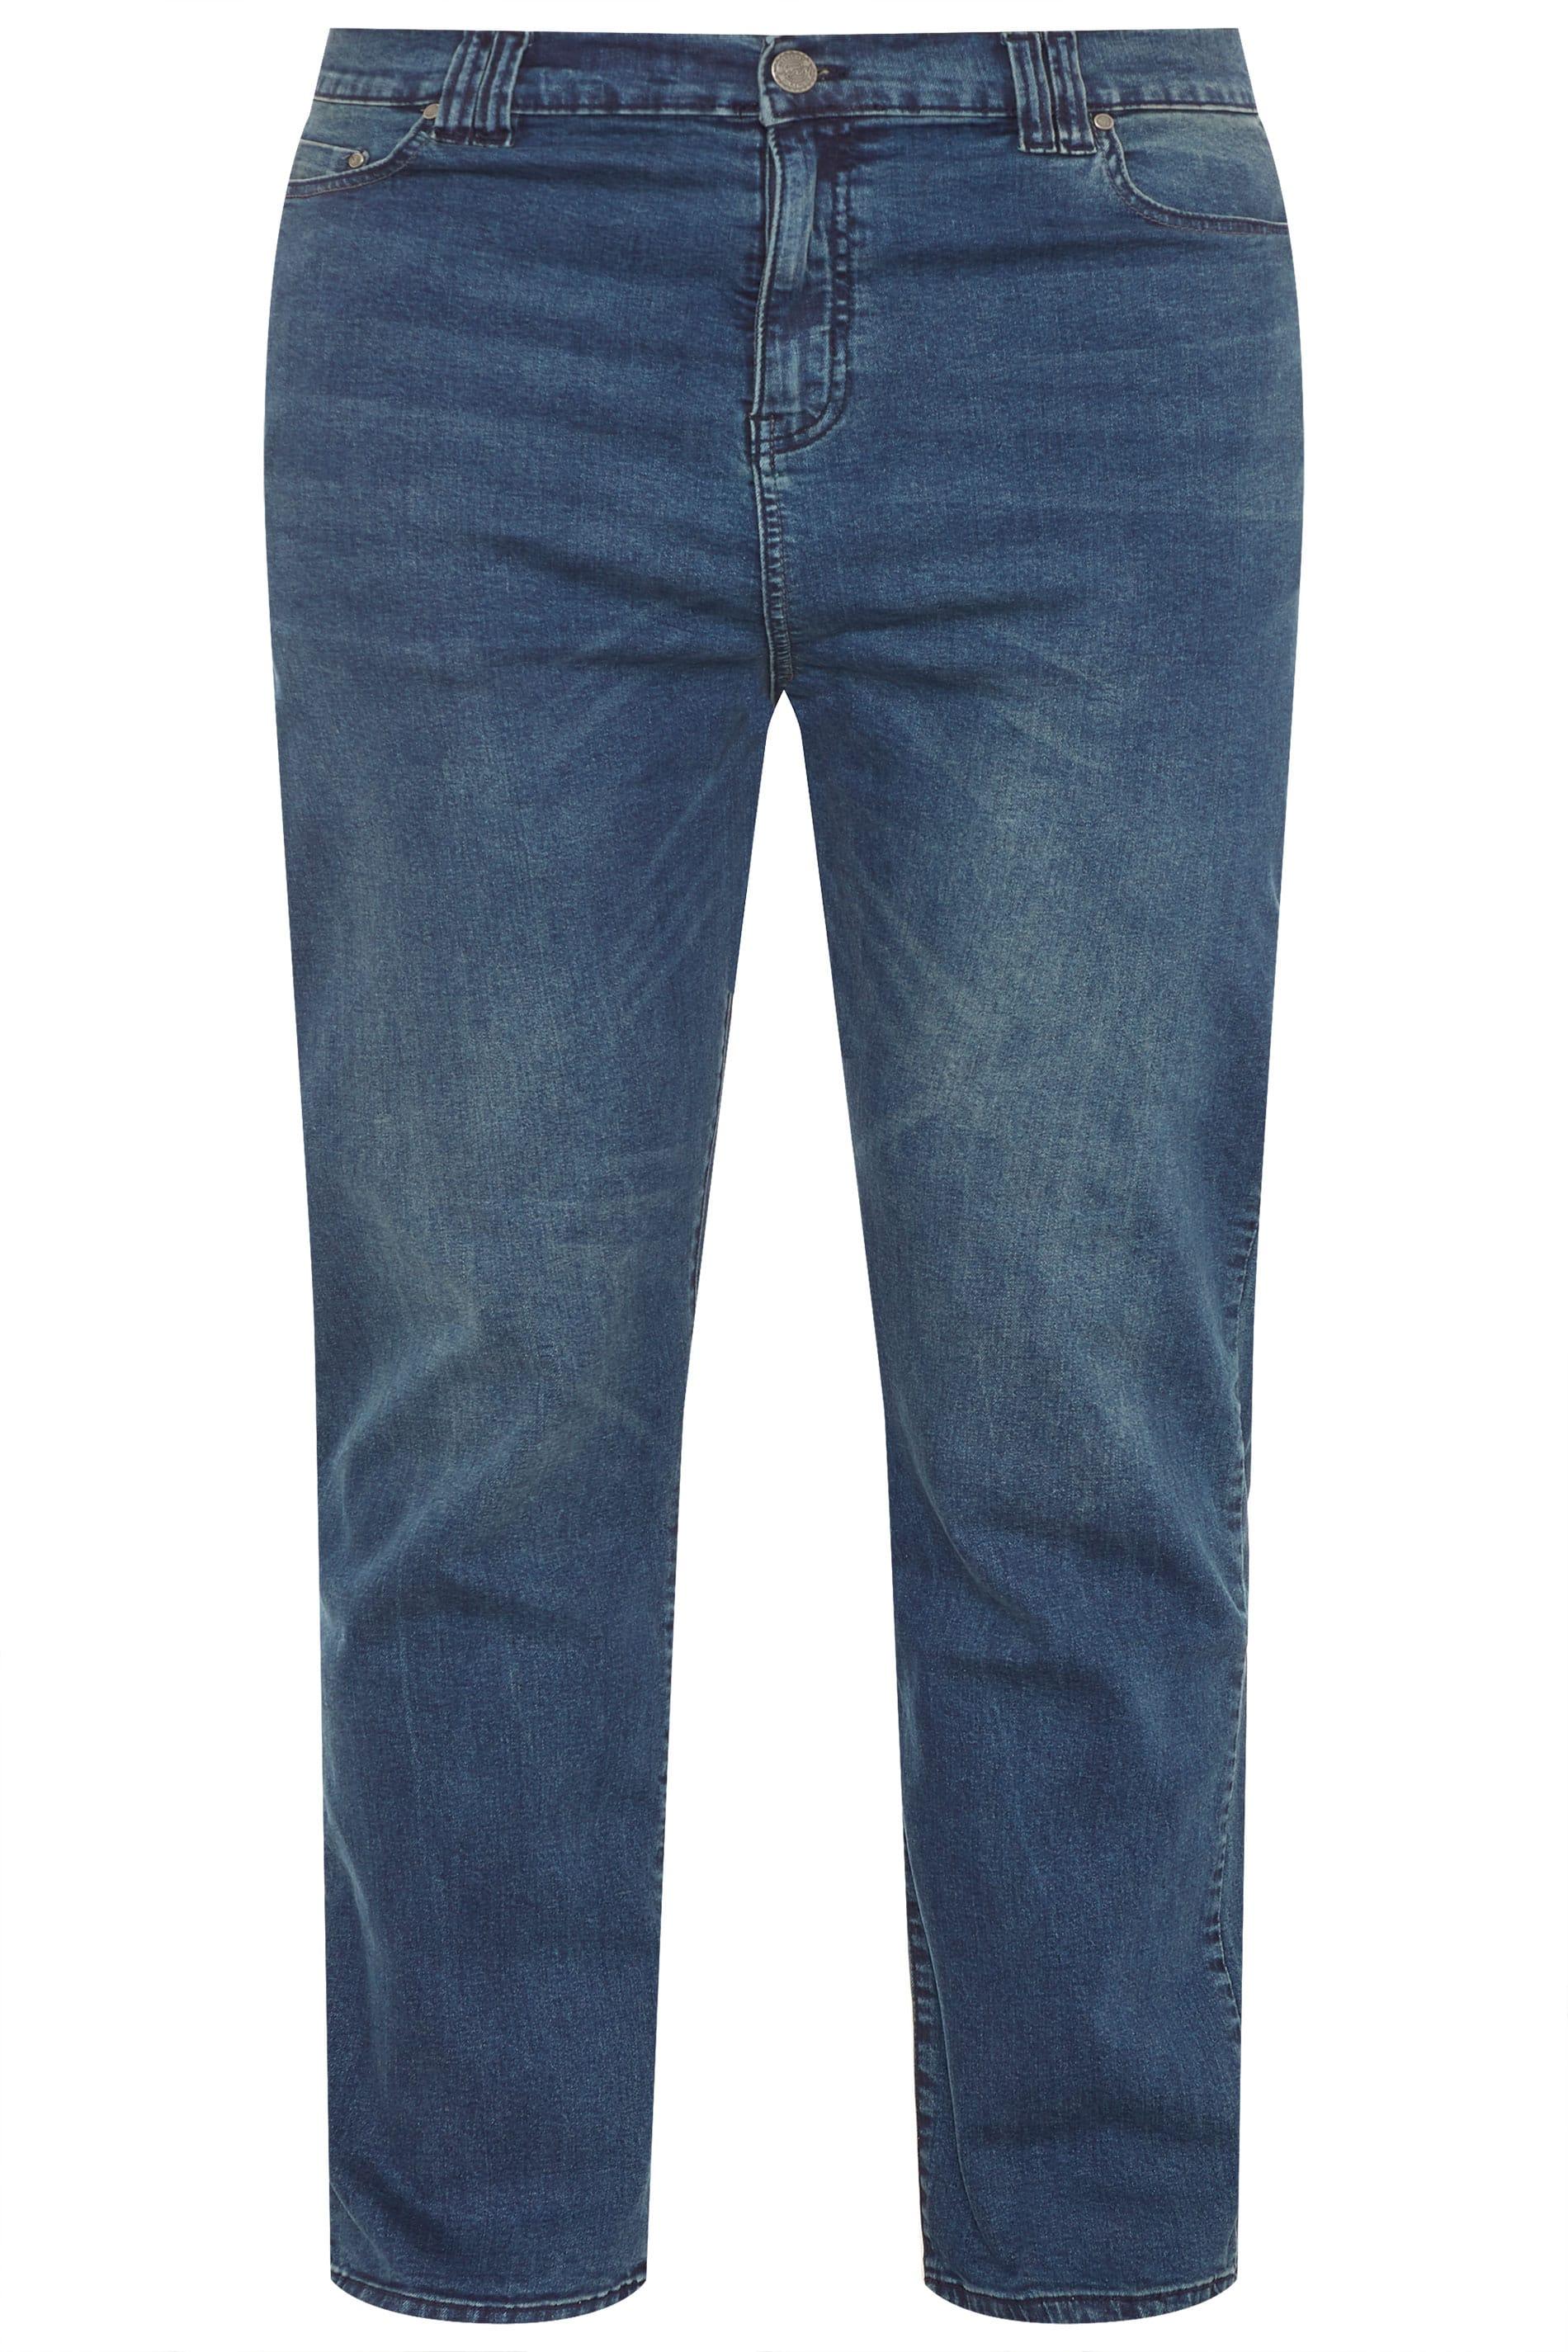 KAM F101 Jeans - Stonewash Blau